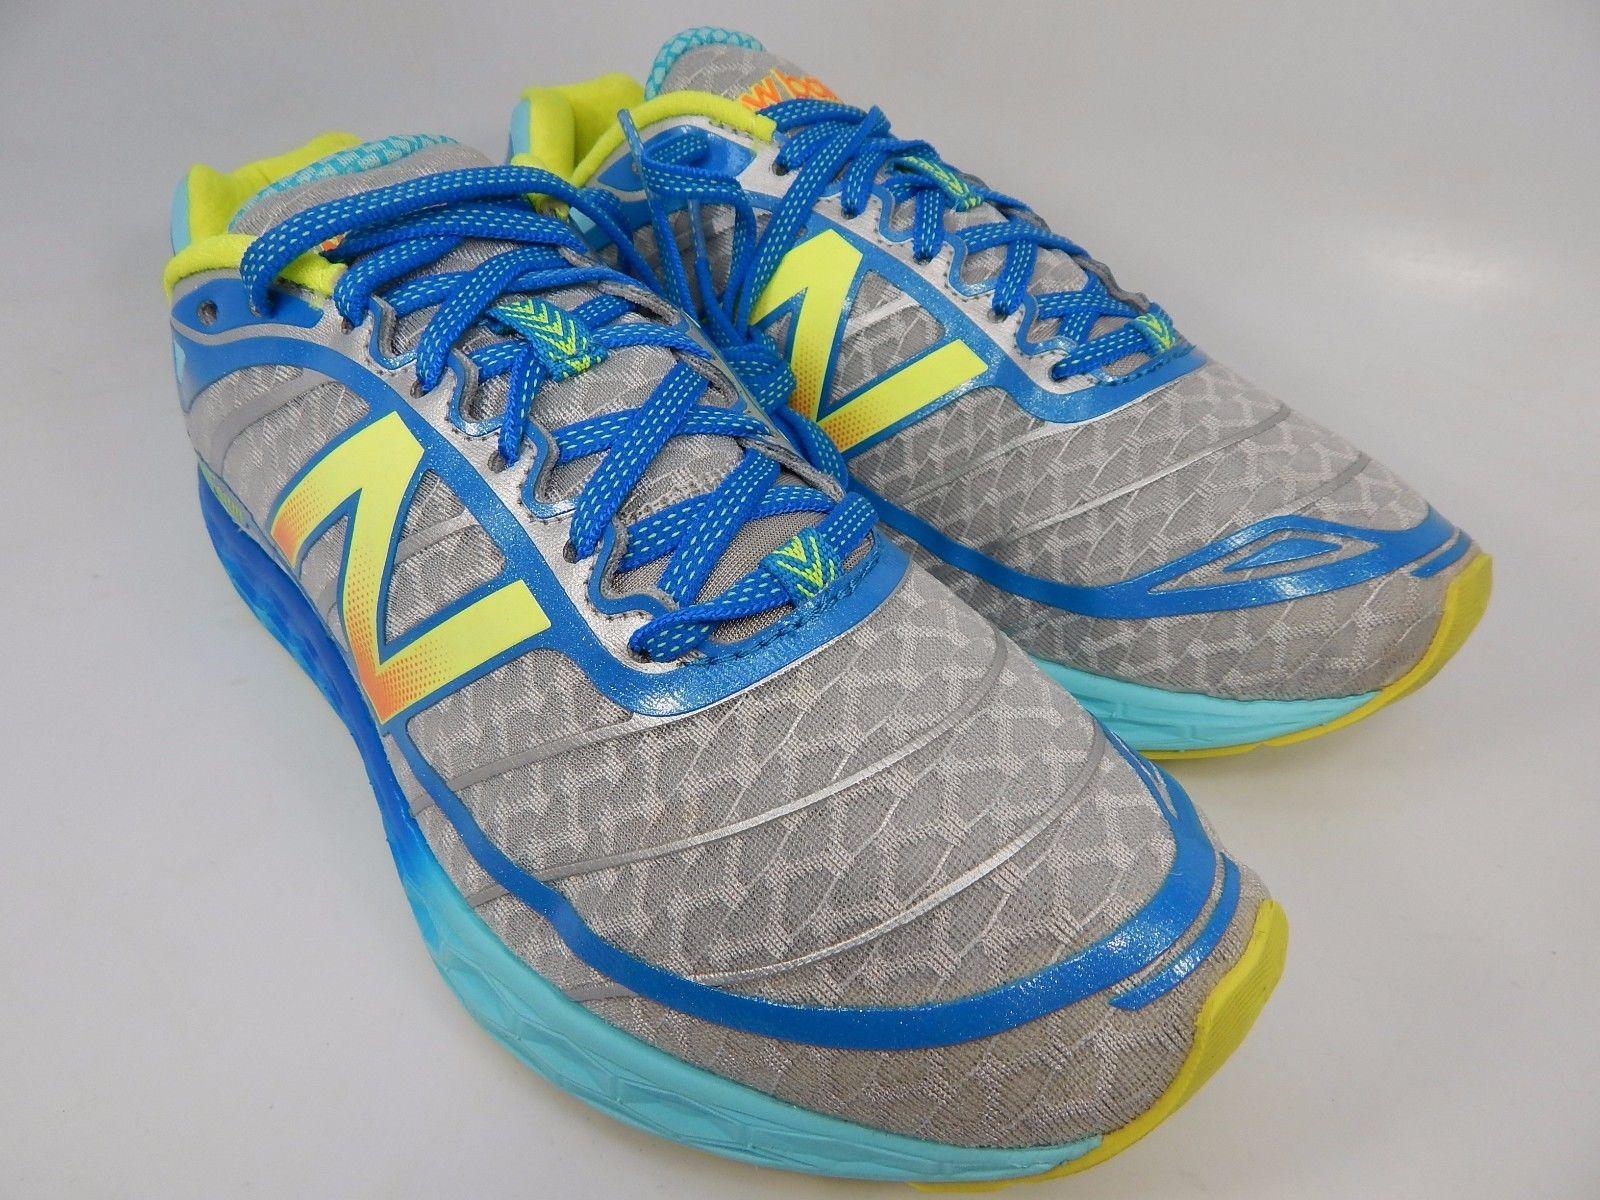 pick up dae6f e42be New Balance 980 v2 Fresh Foam Boracay Women's Shoes Size US 10.5 M (B) EU  42.5